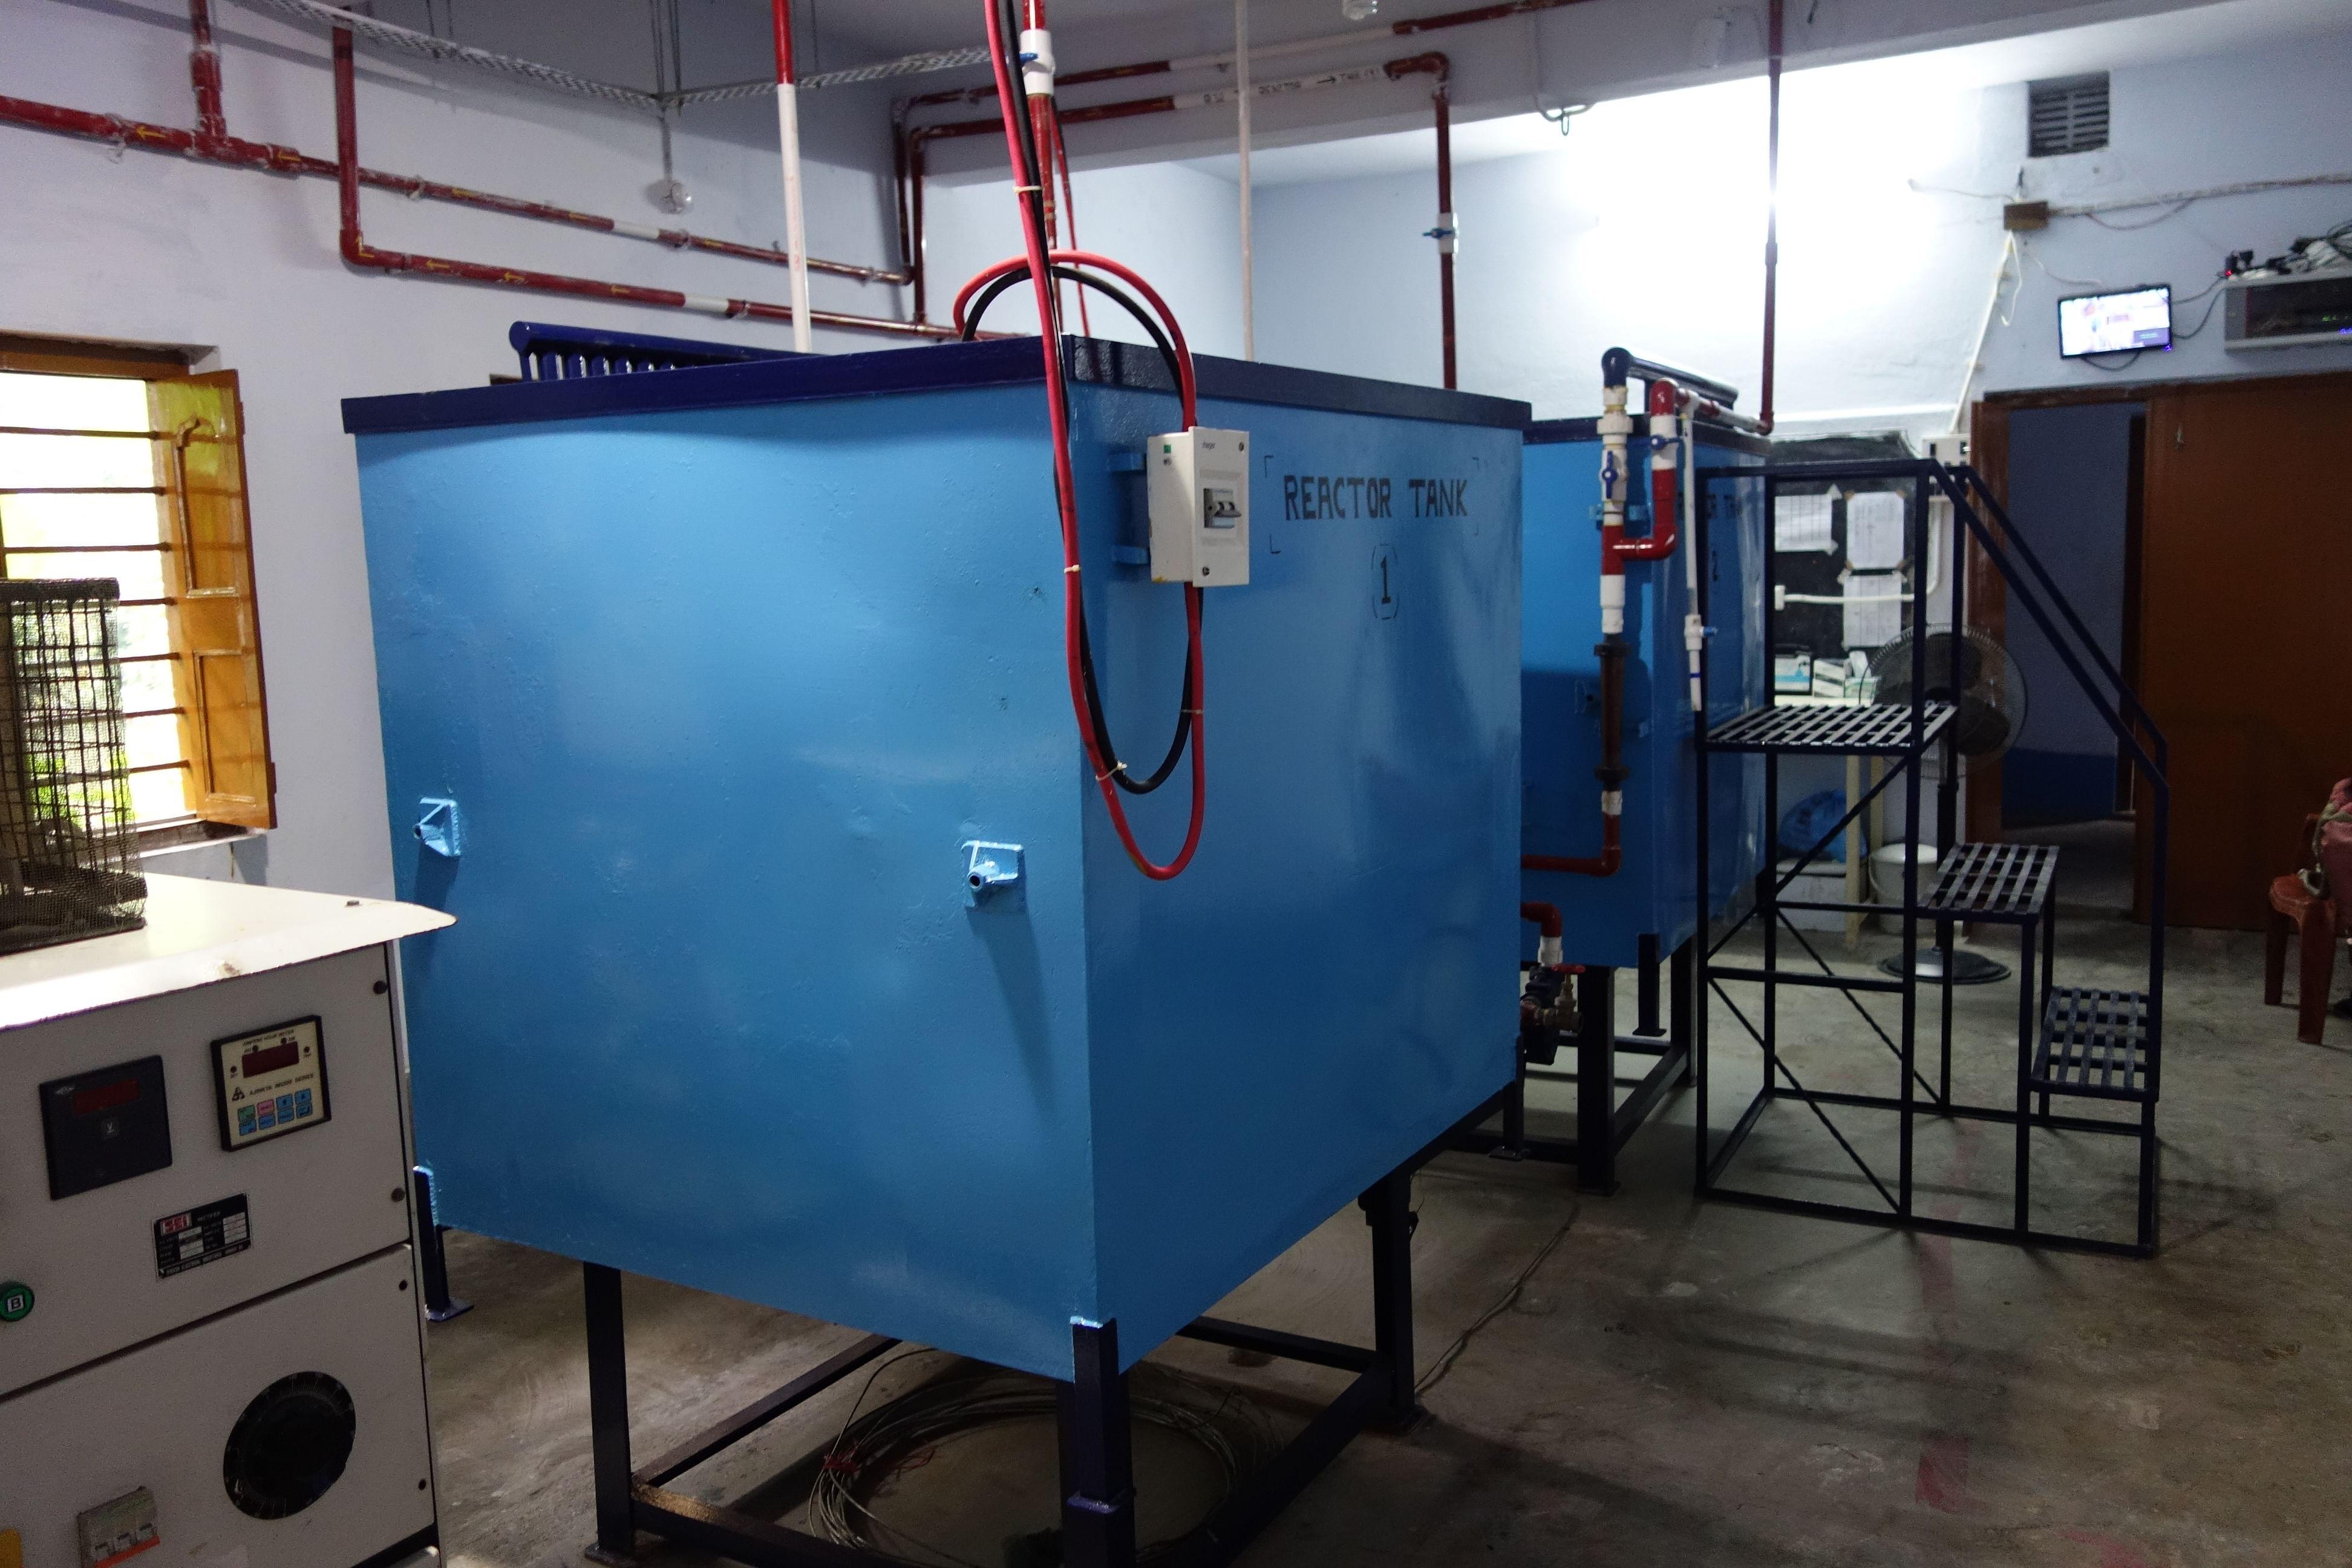 Arsenic removal Reactor Tank.